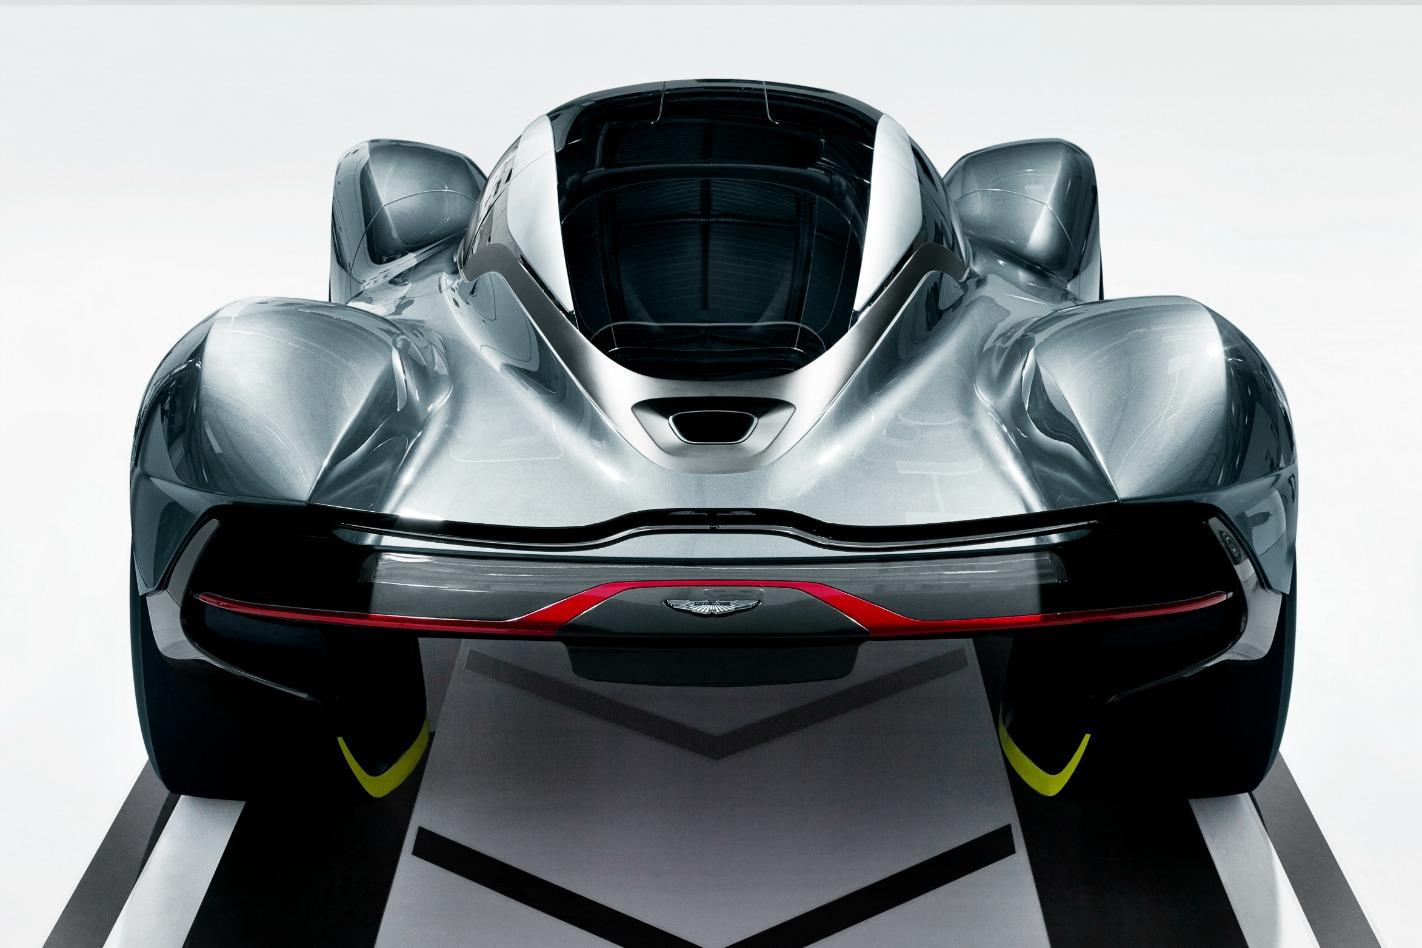 Aston Martin AM-RB 001 Rear 2